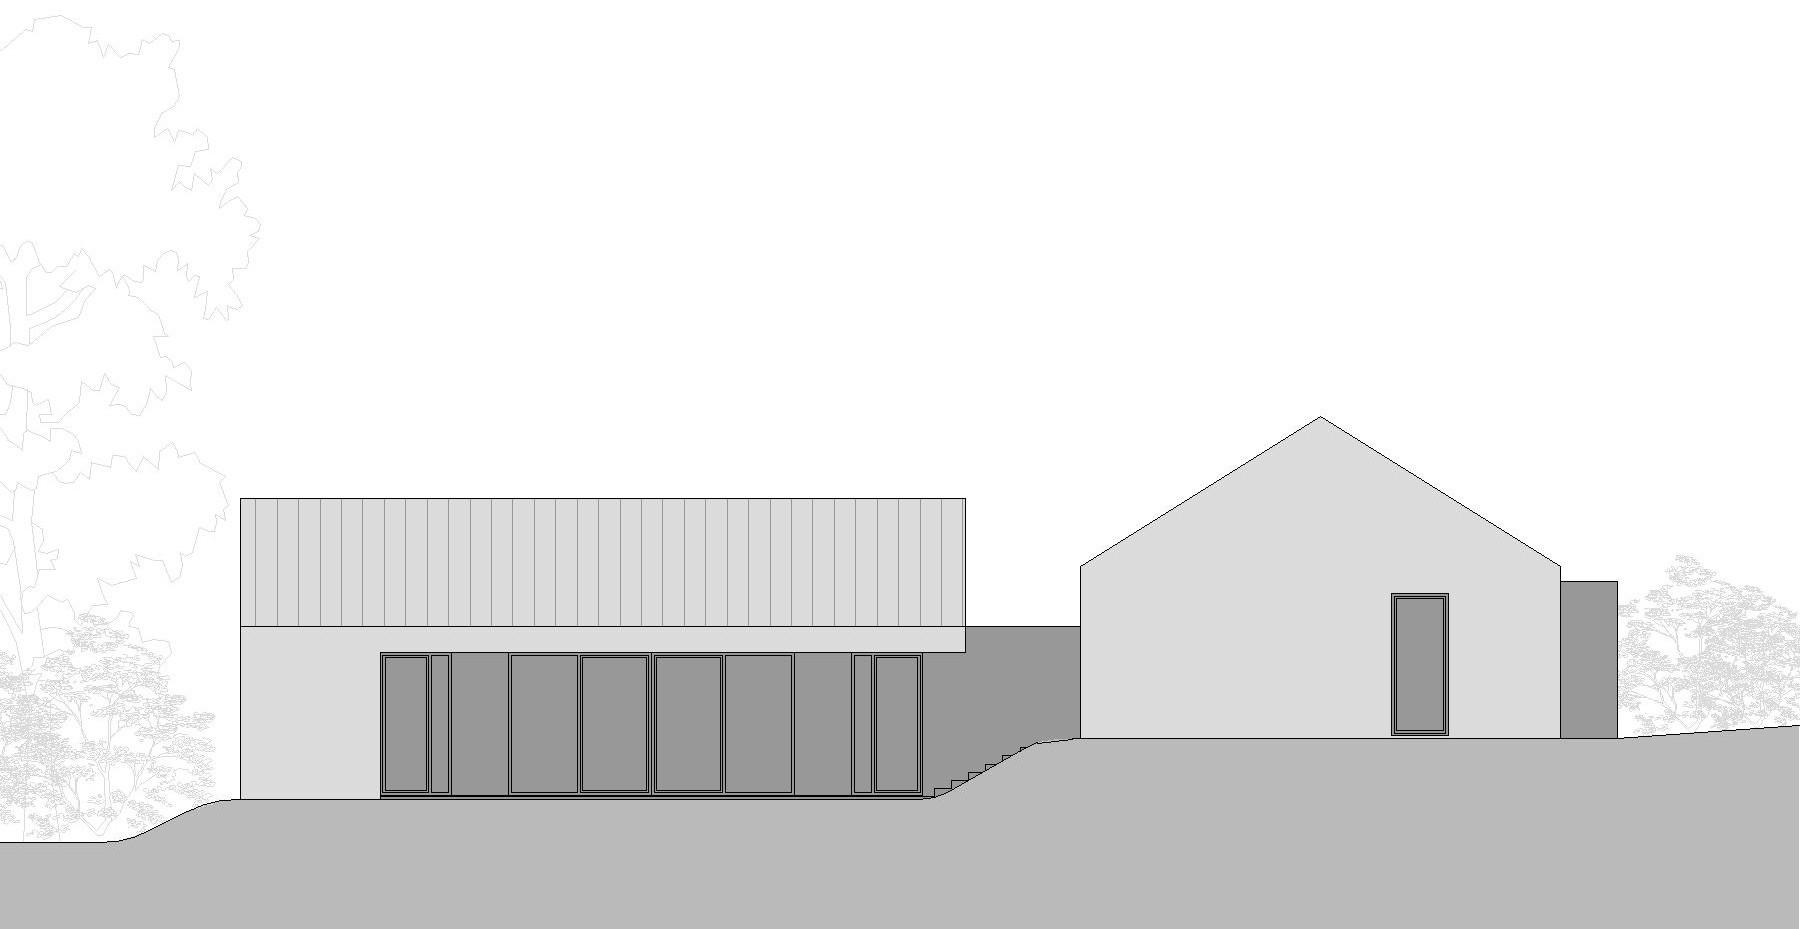 viceurovnova-moderni-vila-se-sikmou-strechou-dream-homes-plavec-pohled